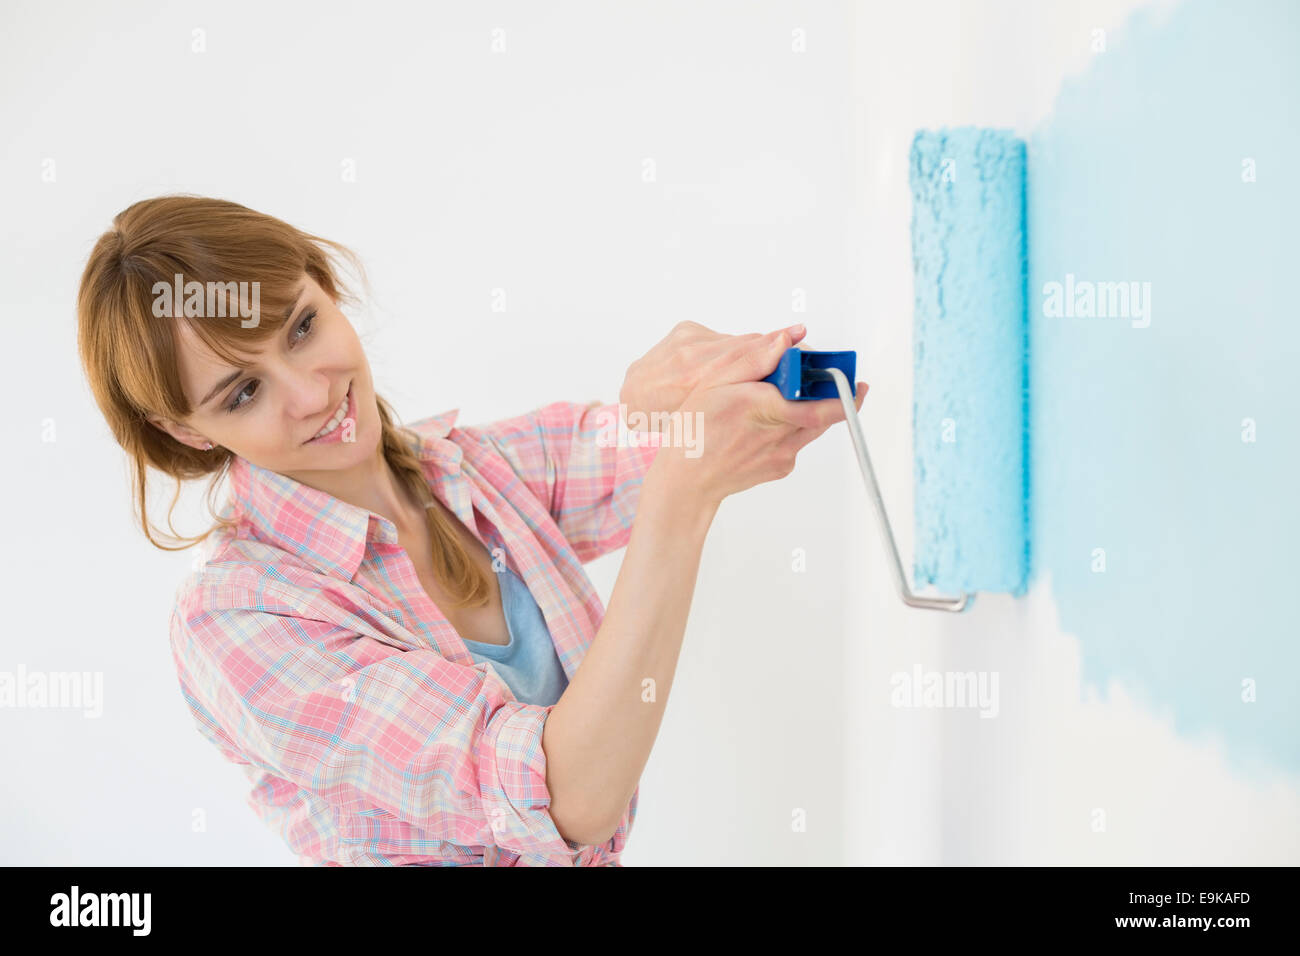 Schöne Frau Malerei Wand mit Farbroller Stockbild